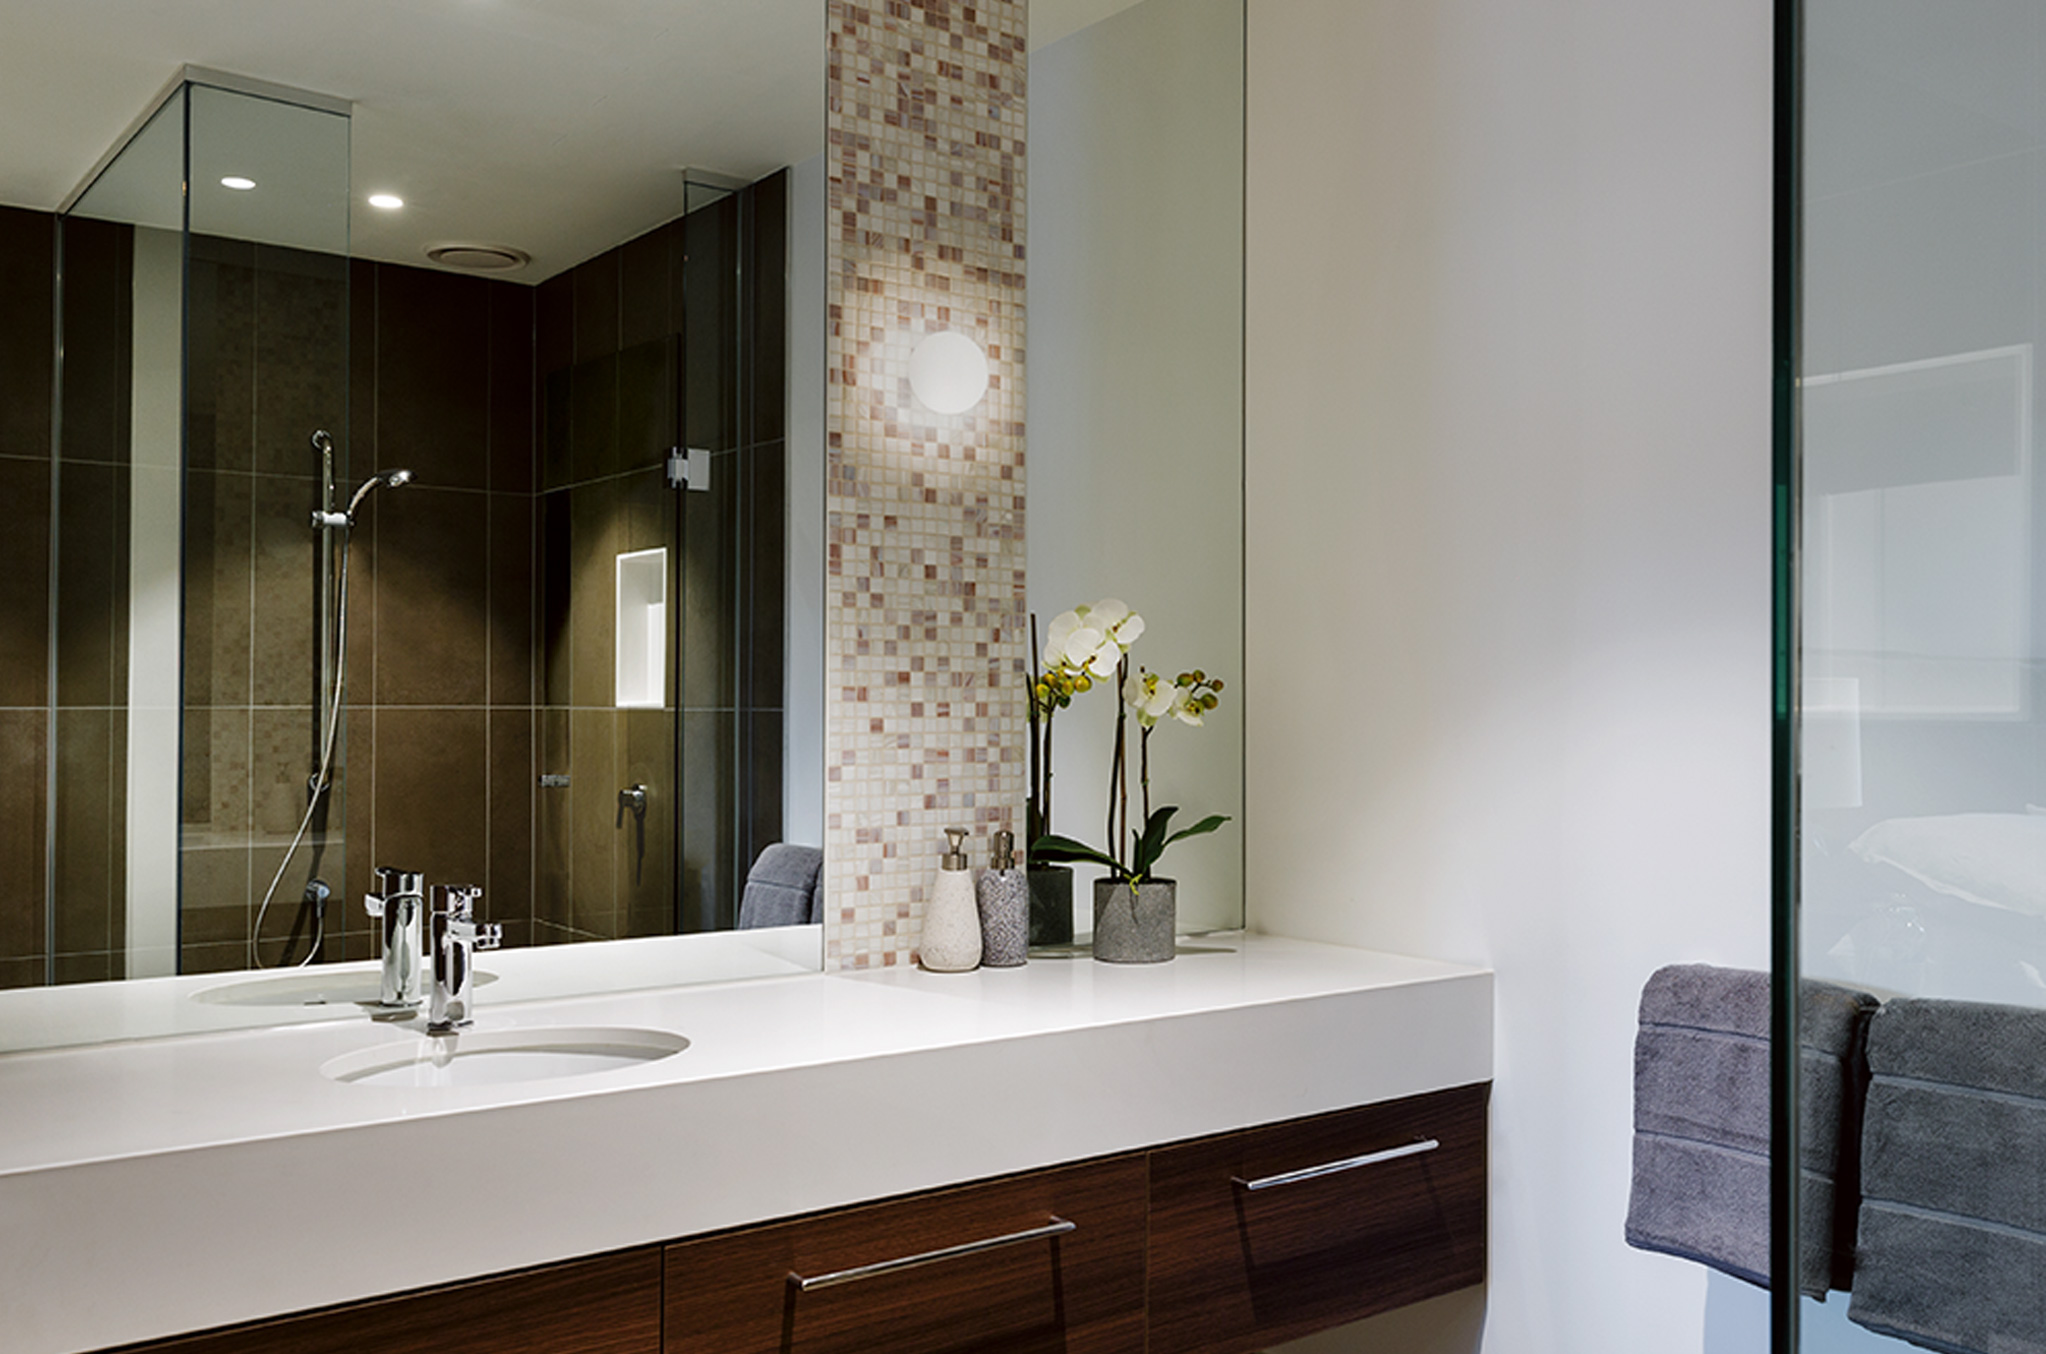 An apartment bathroom at Drummond Place Carlton